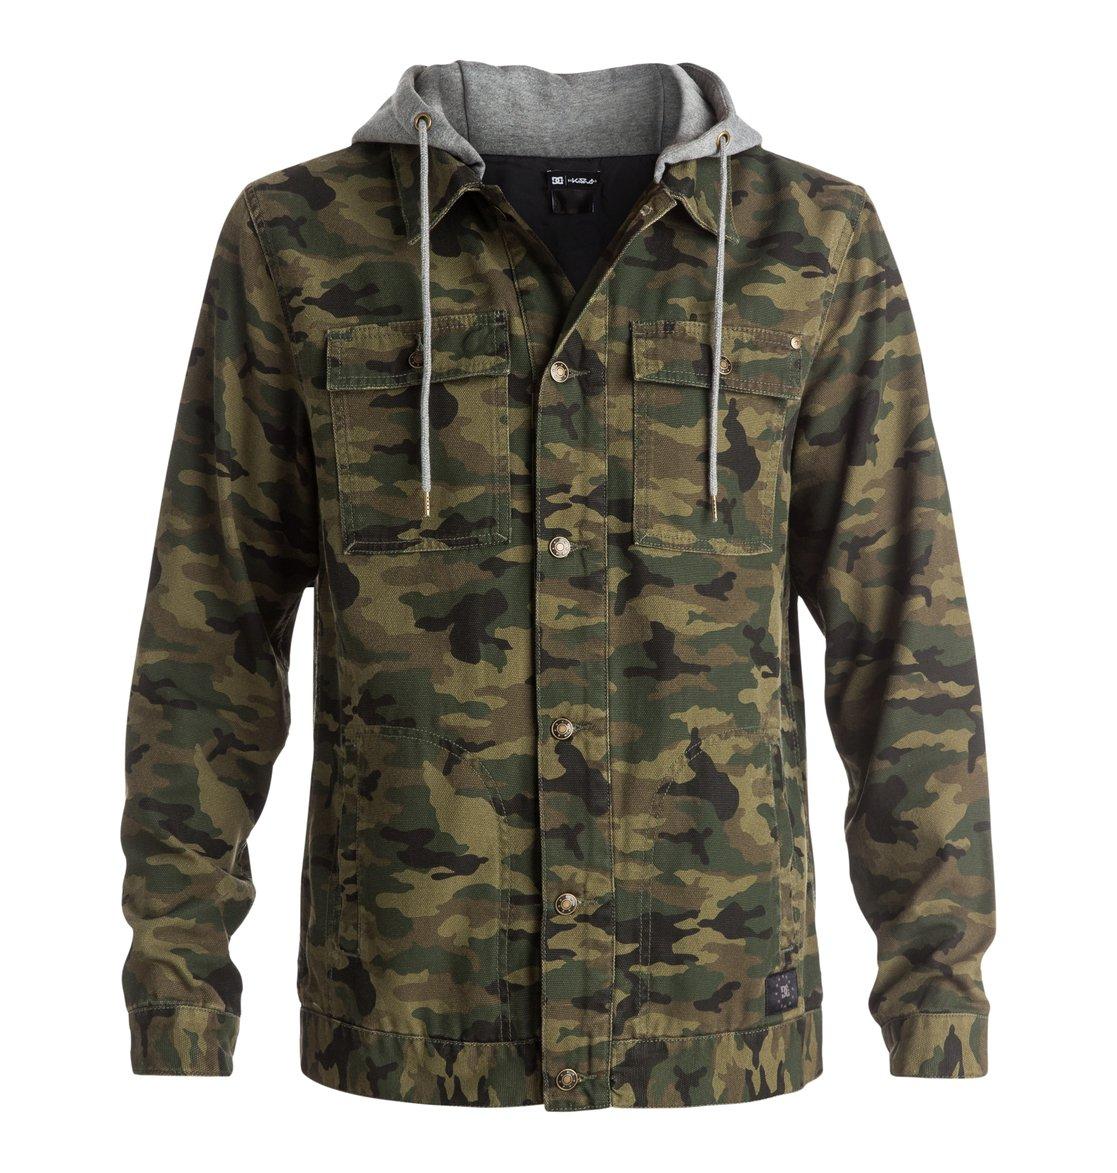 Dcshoes Мужская куртка Kalis Kalis Jacket